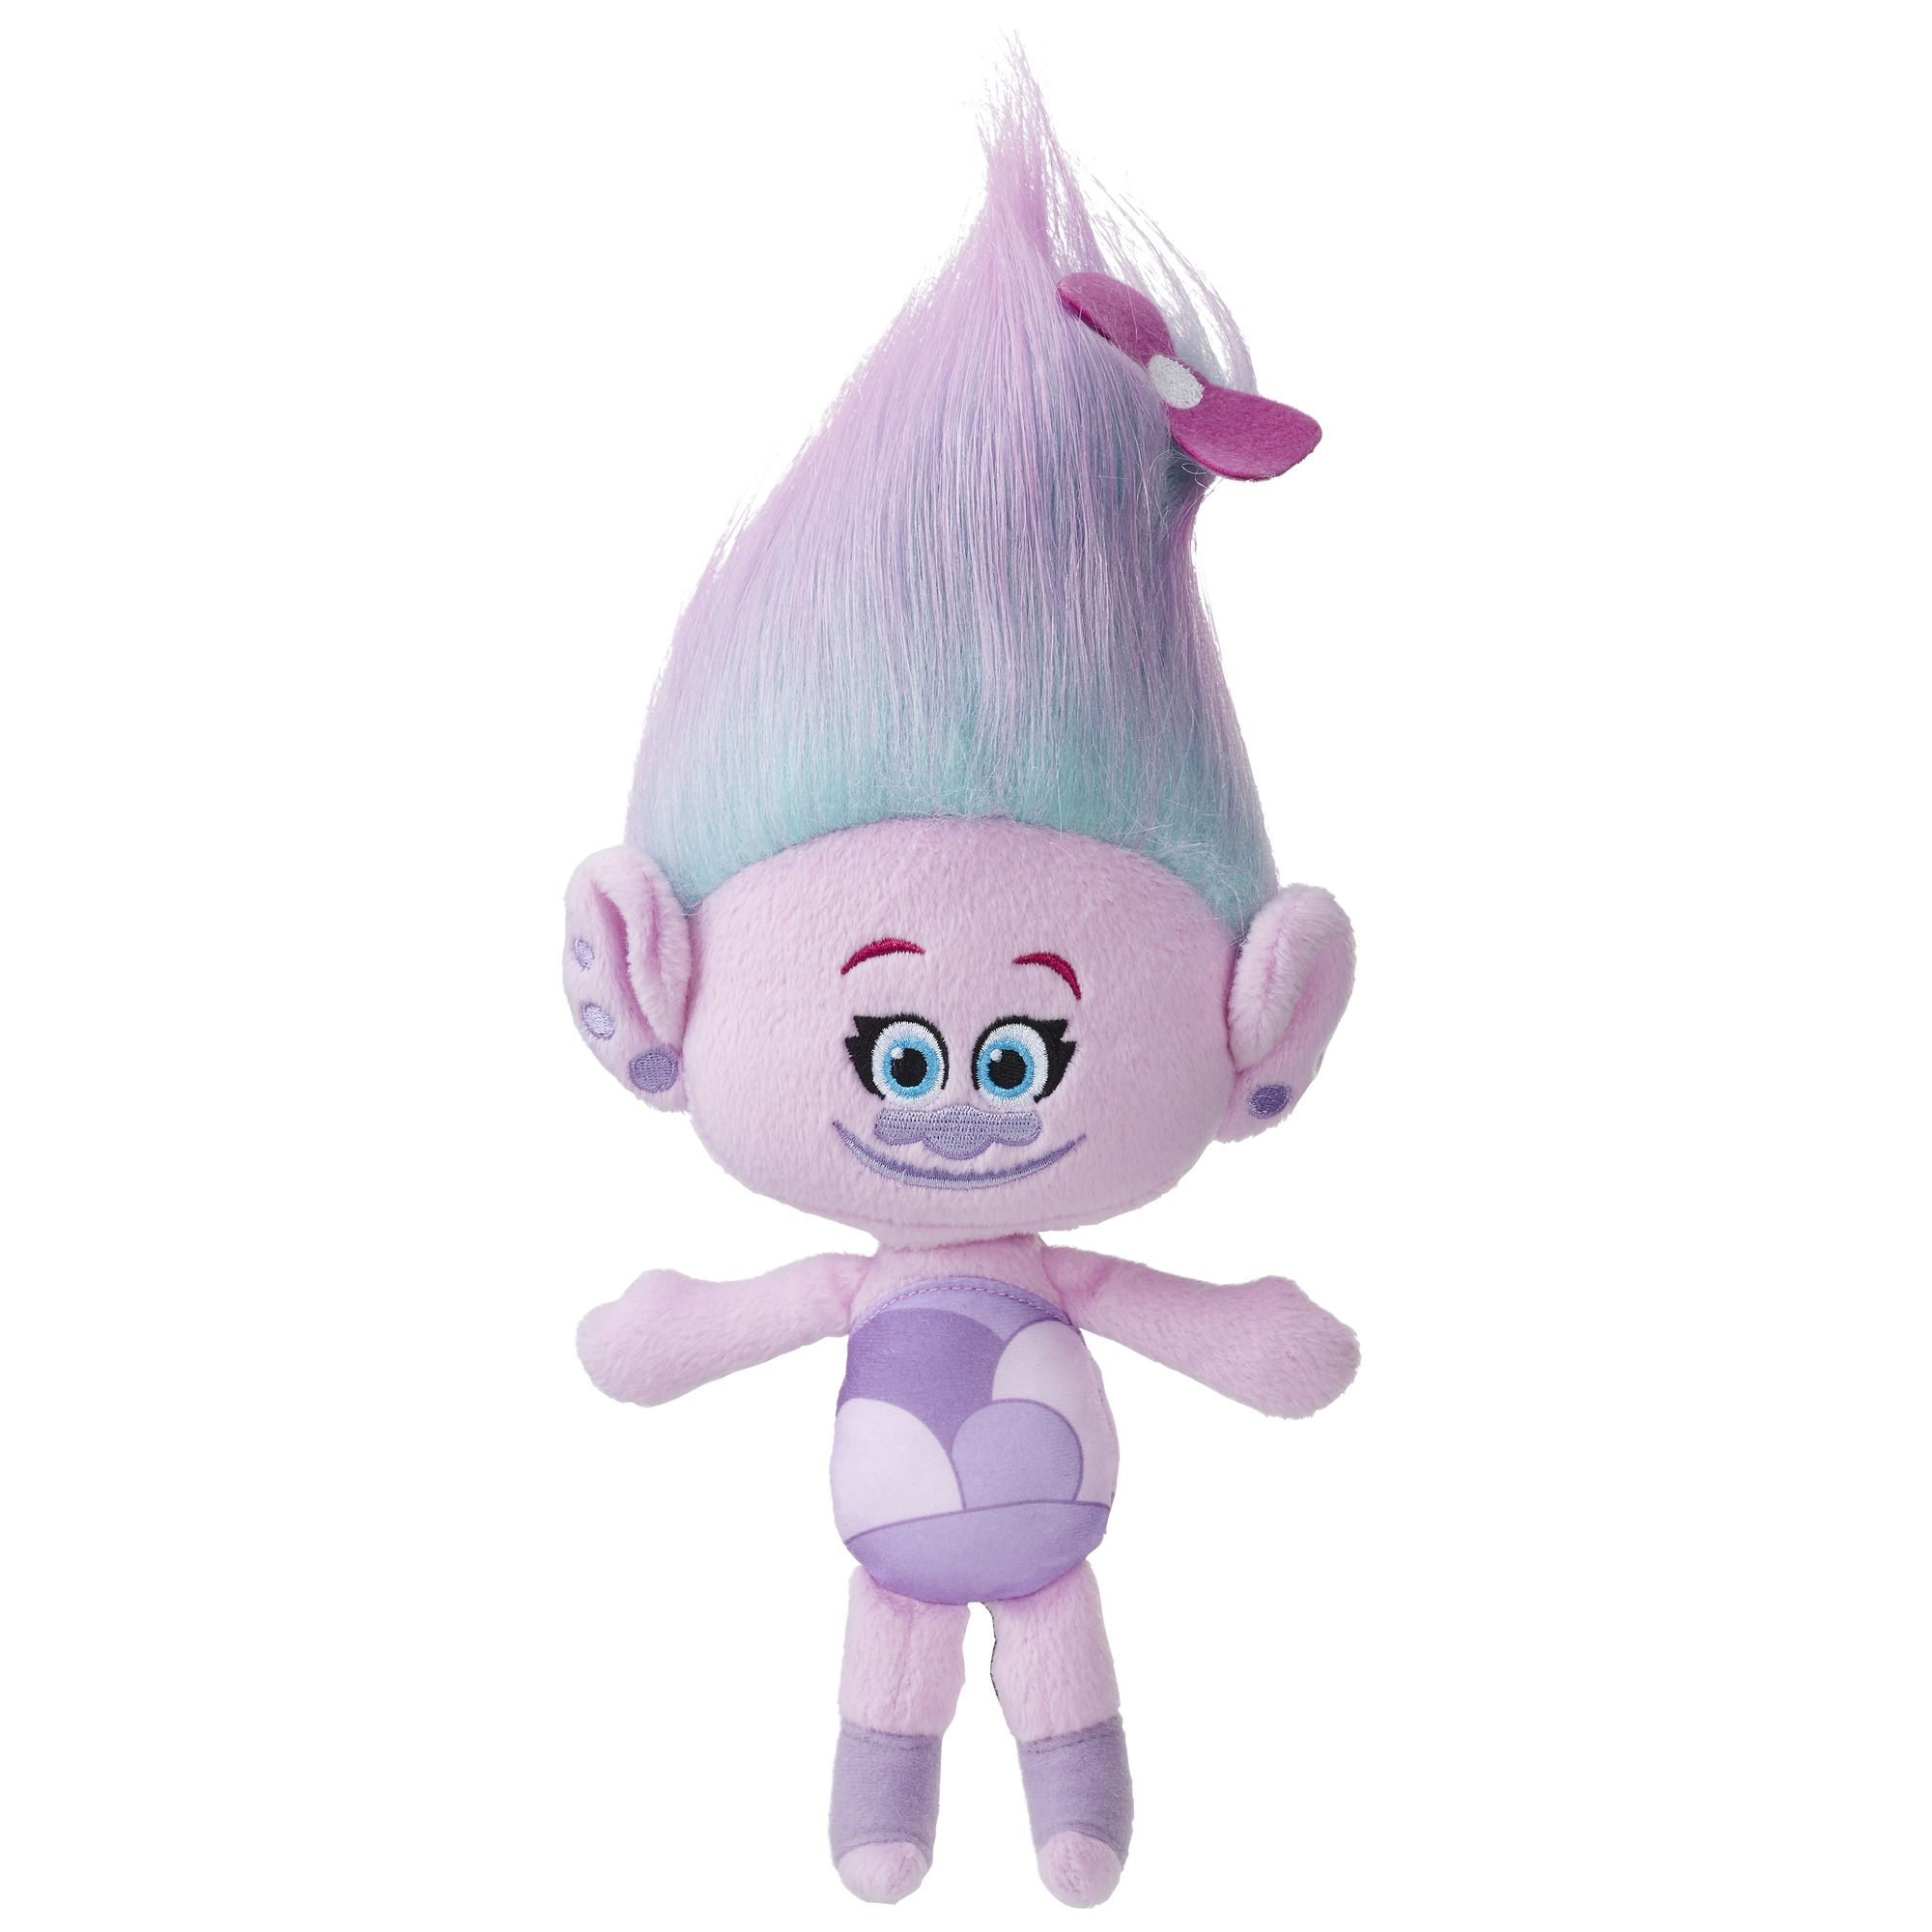 Dreamworks Trolls Satin Hug N Plush Doll Multi Color Plush Dolls Dreamworks Trolls Dreamworks